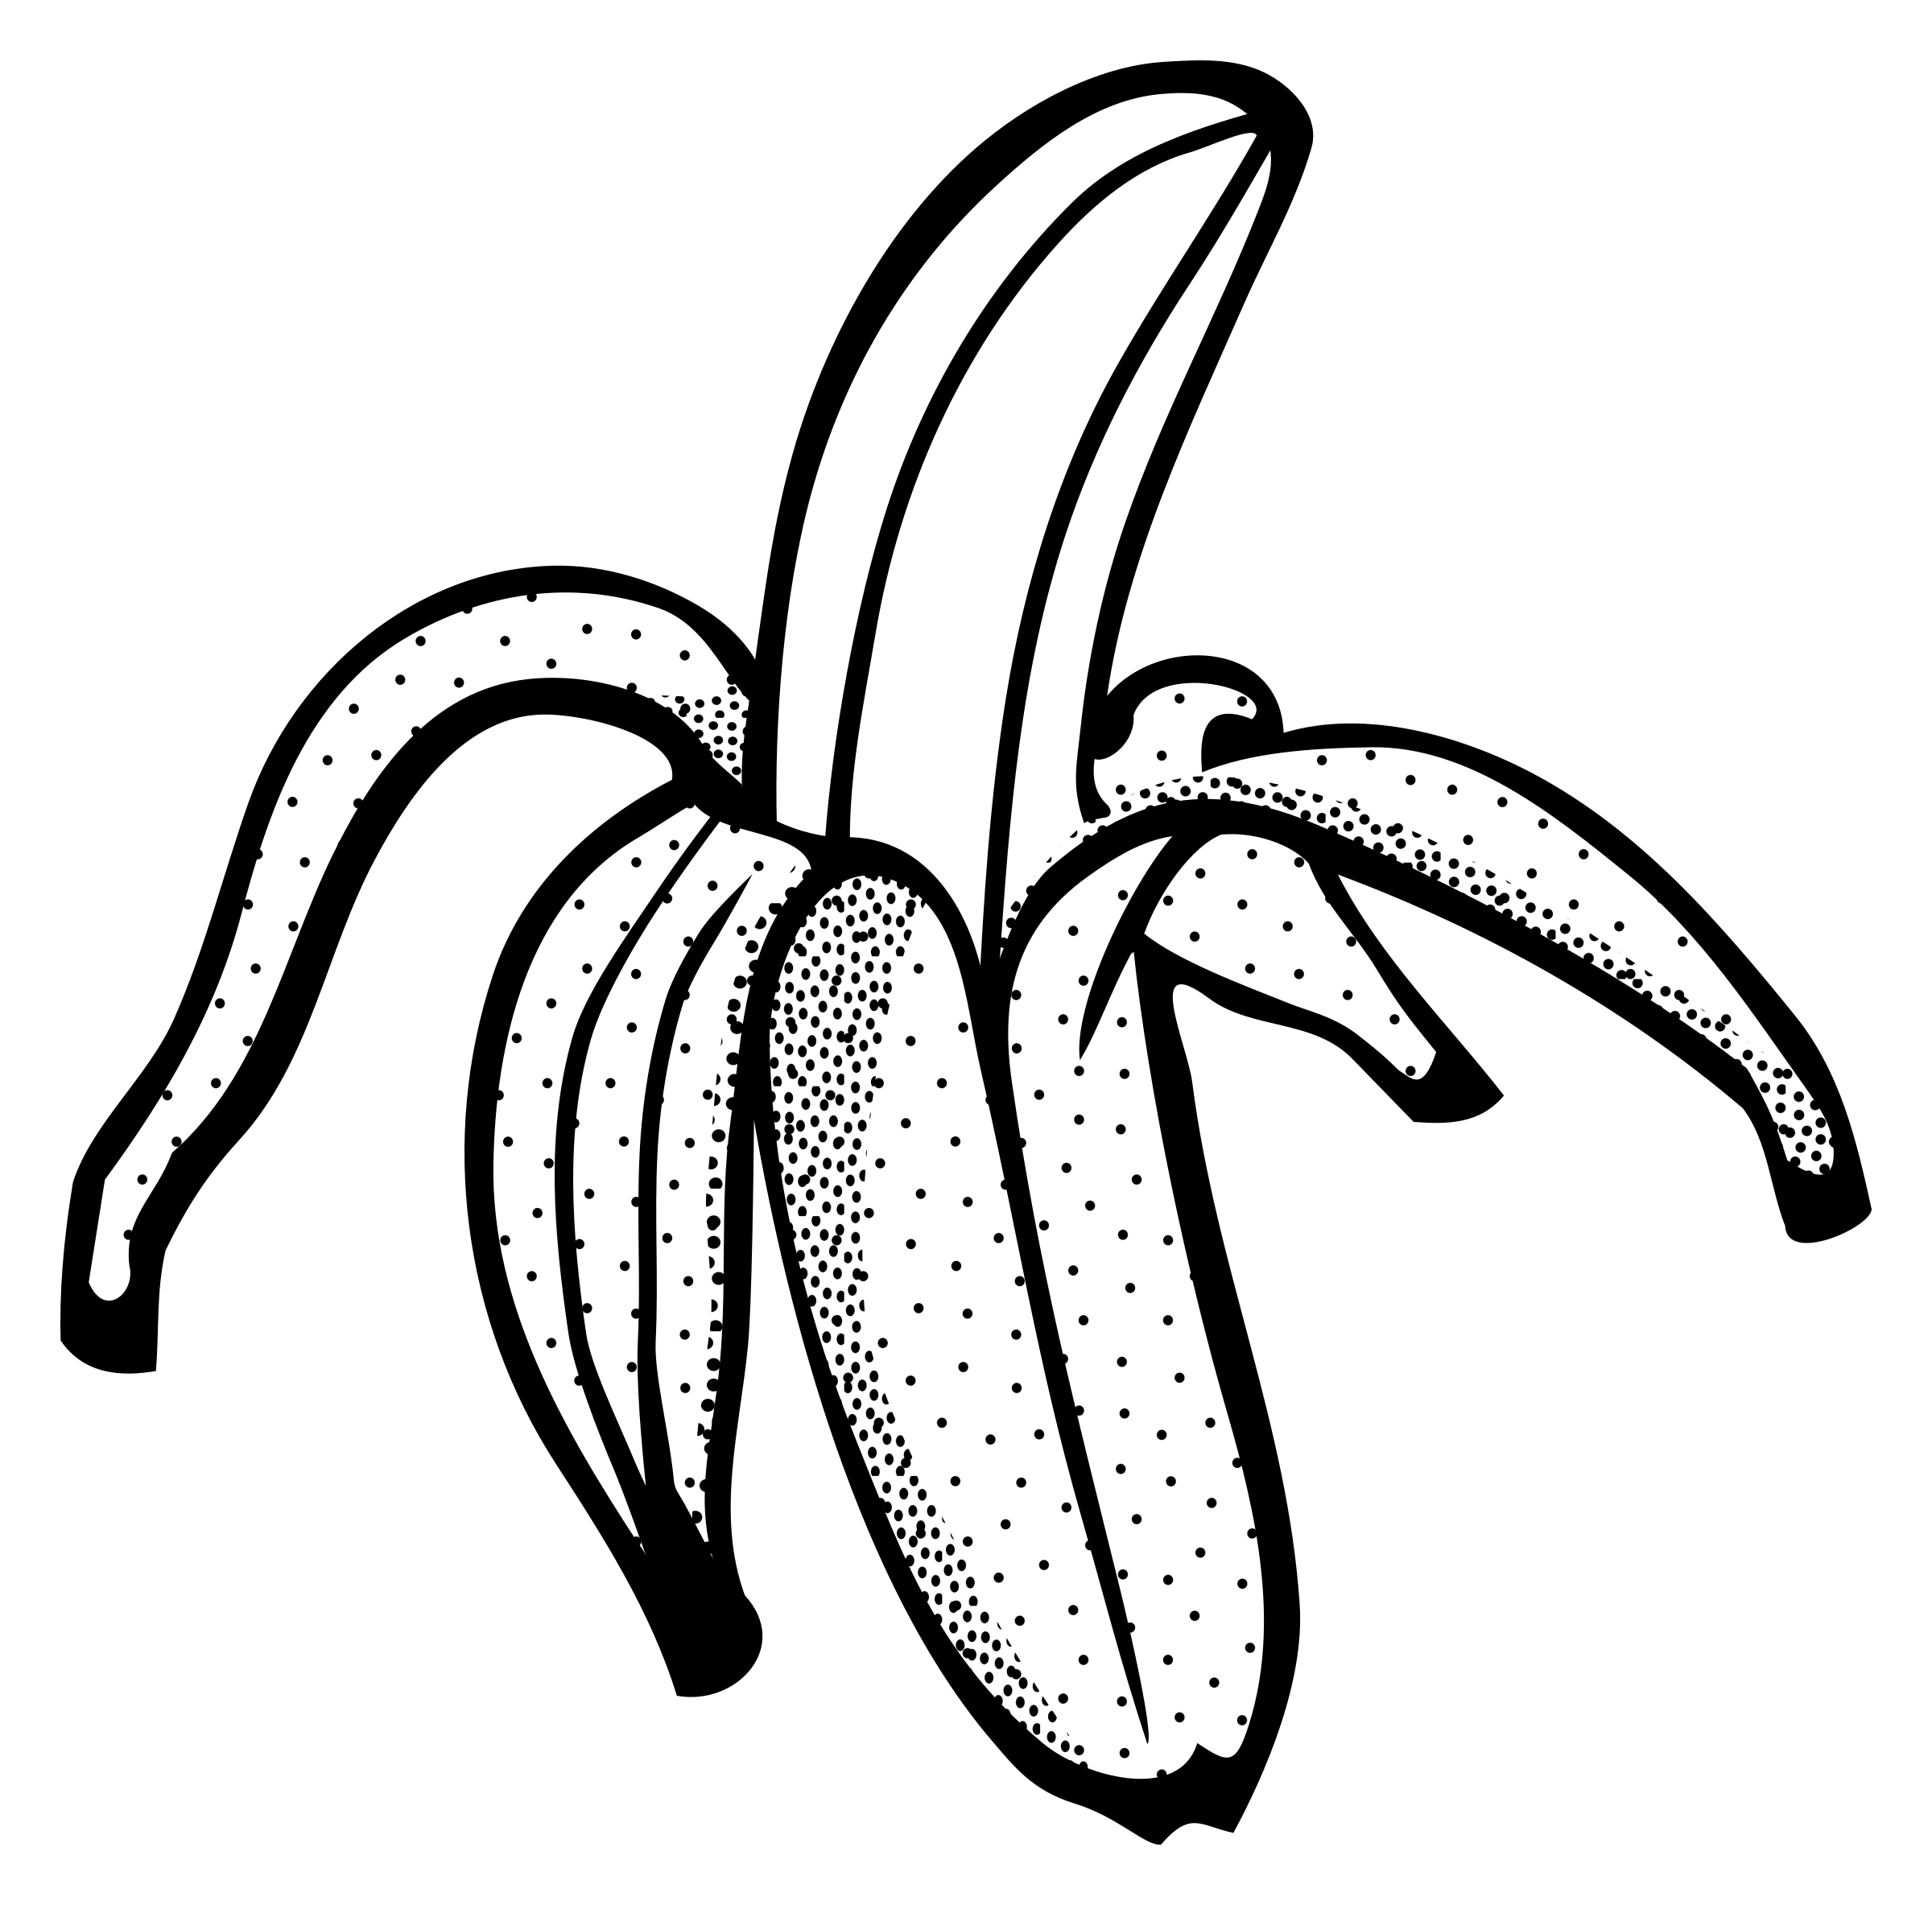 Banana clipart line drawing Lineart Clipart lineart banana banana